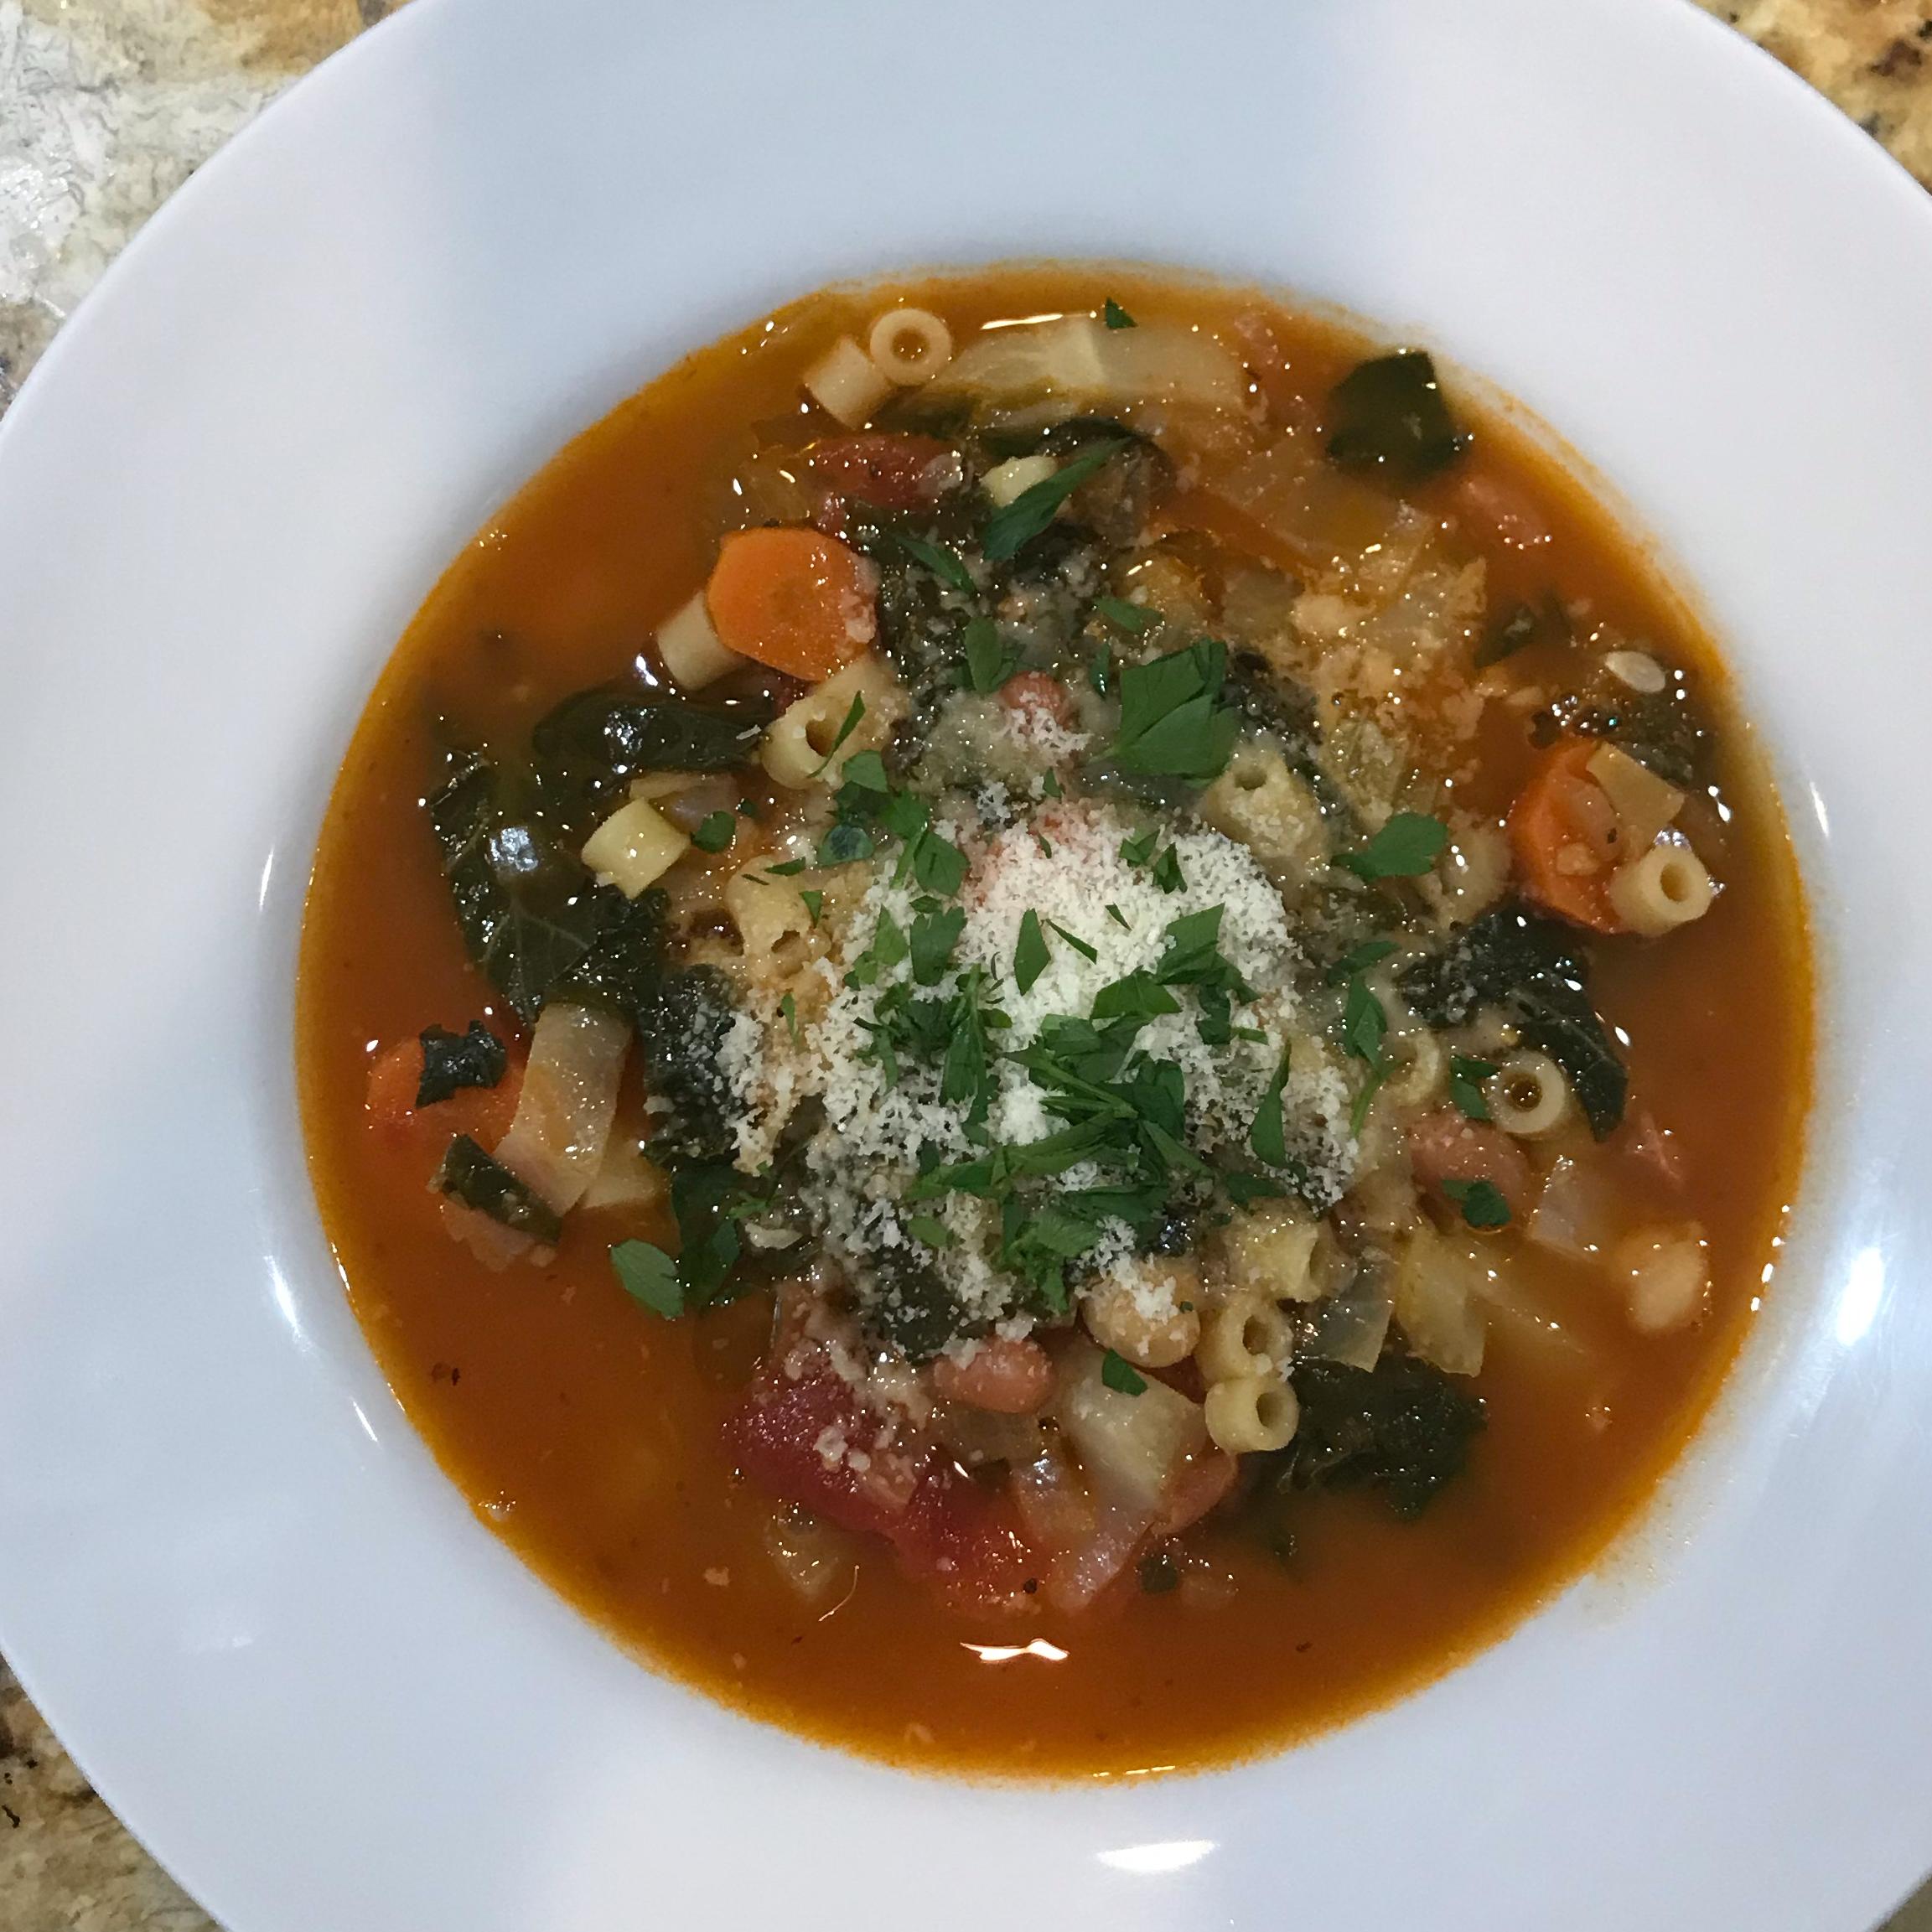 Chef John's Minestrone Soup